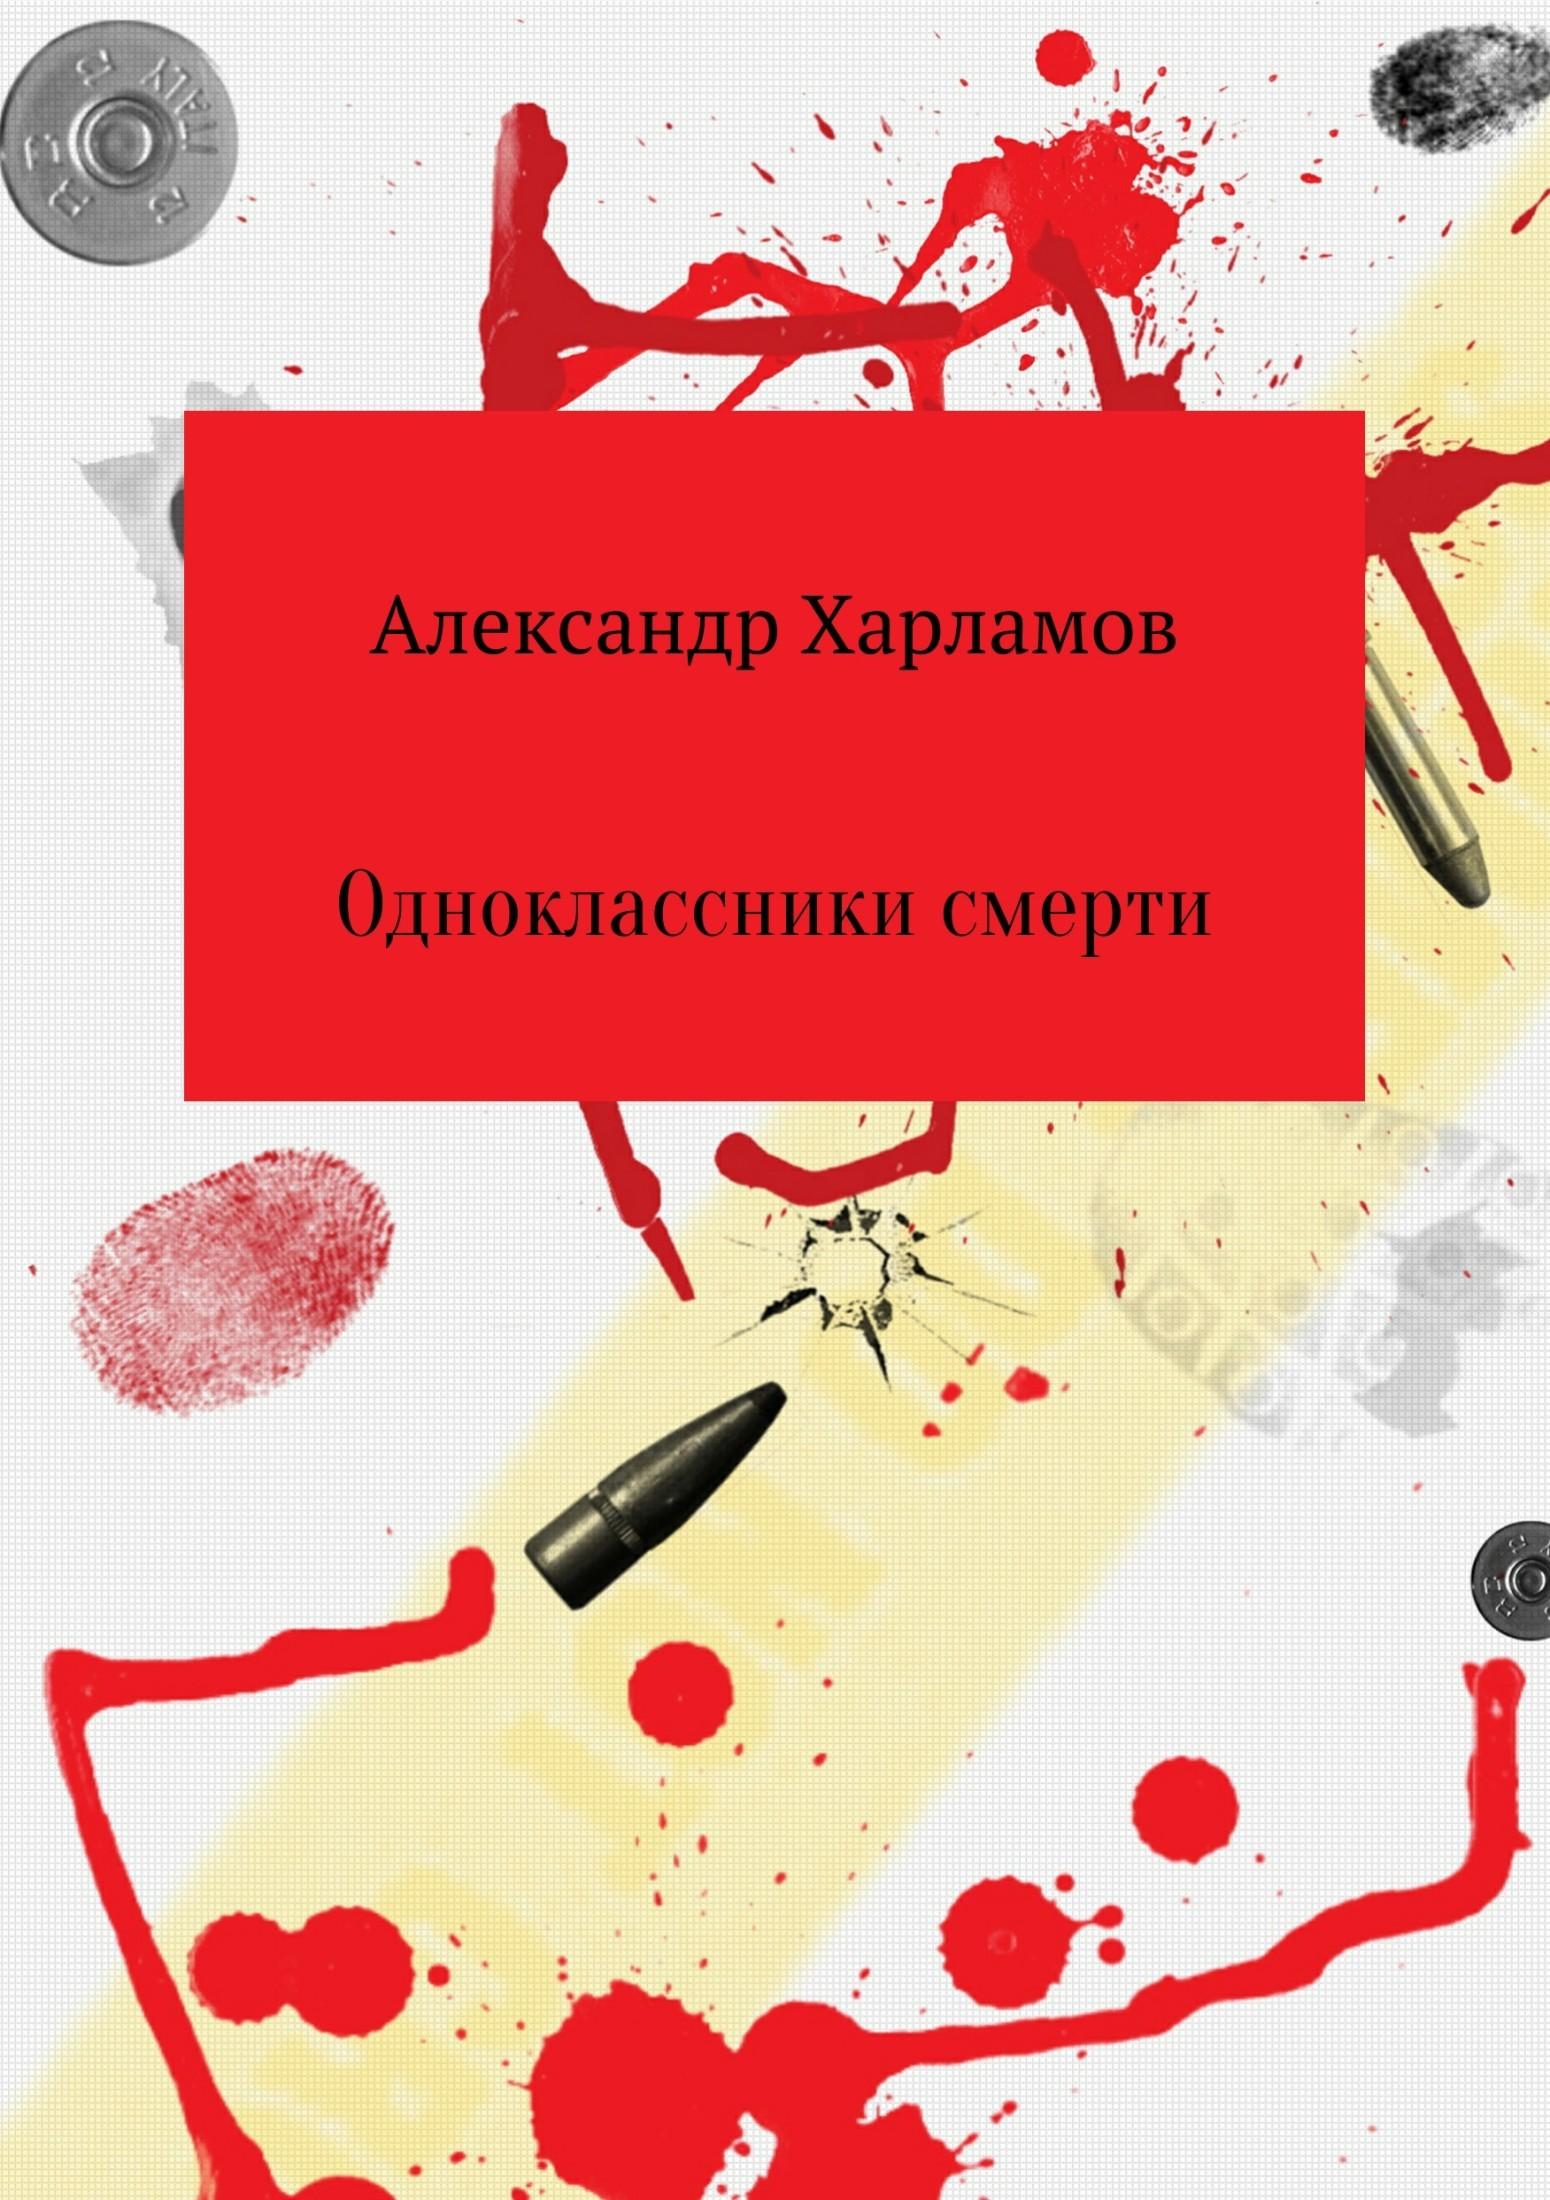 Александр Сергеевич Харламов. Одноклассники смерти